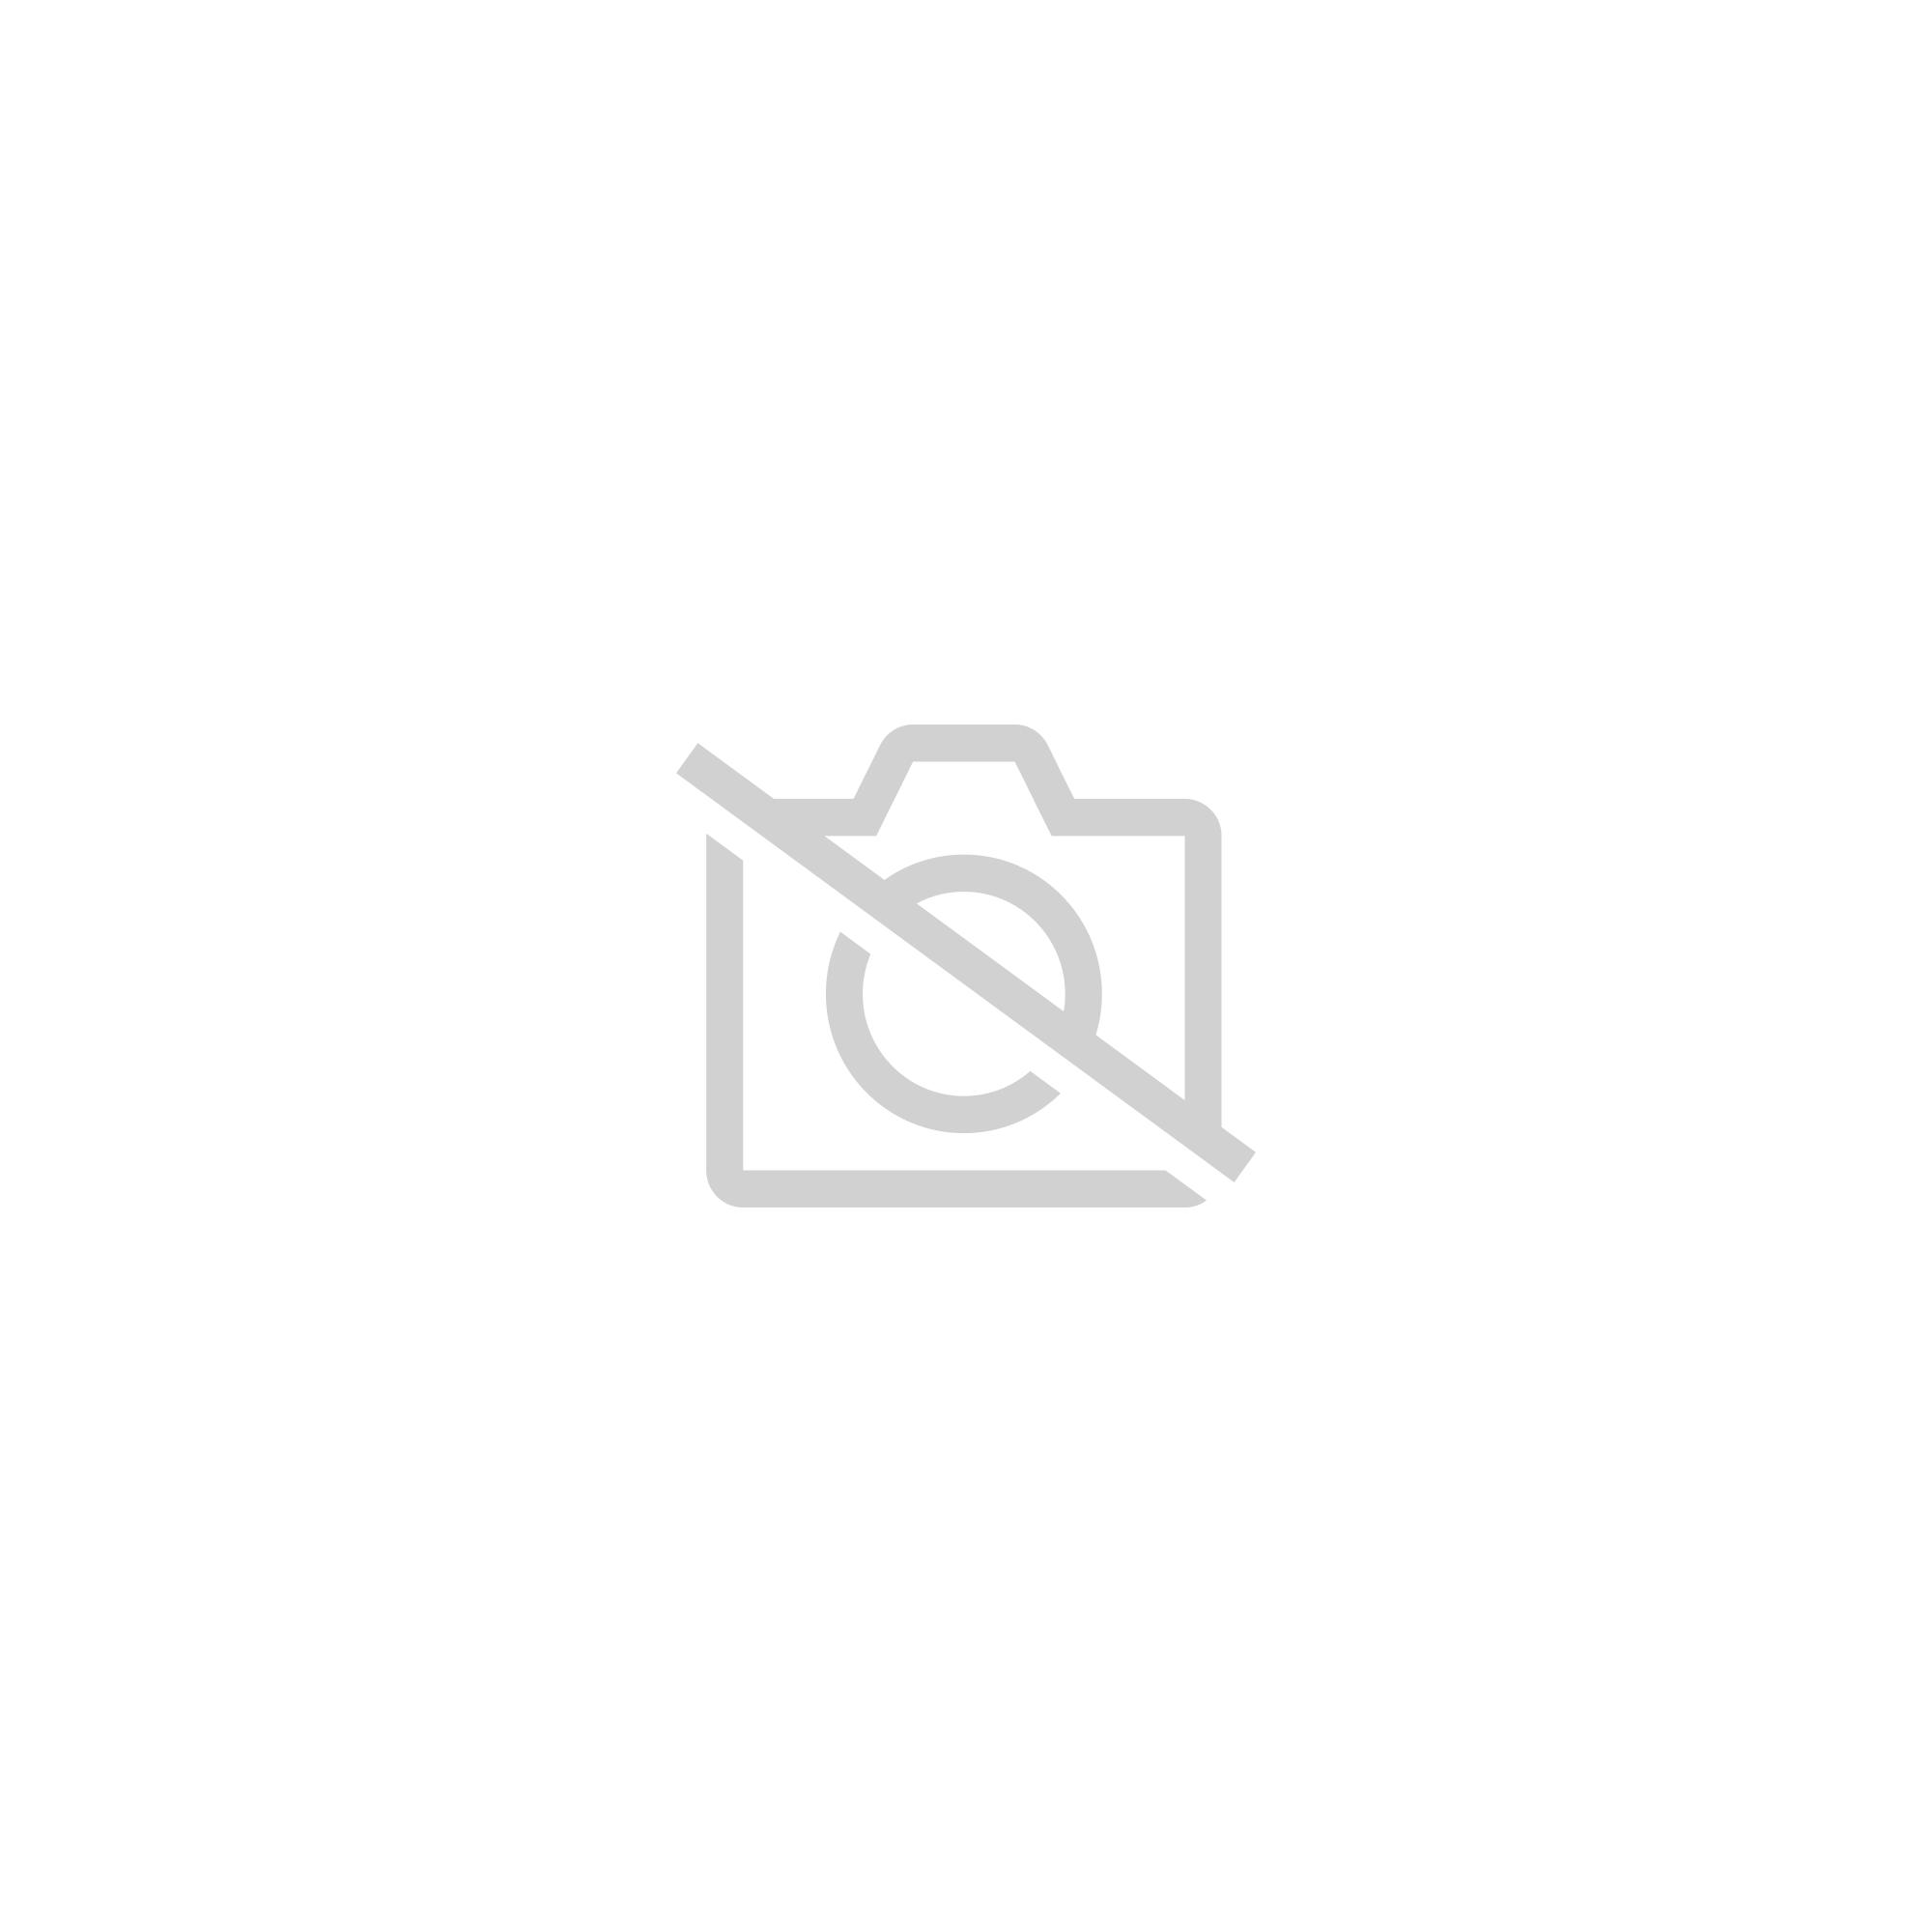 Basket adidas americana la Rougeoute